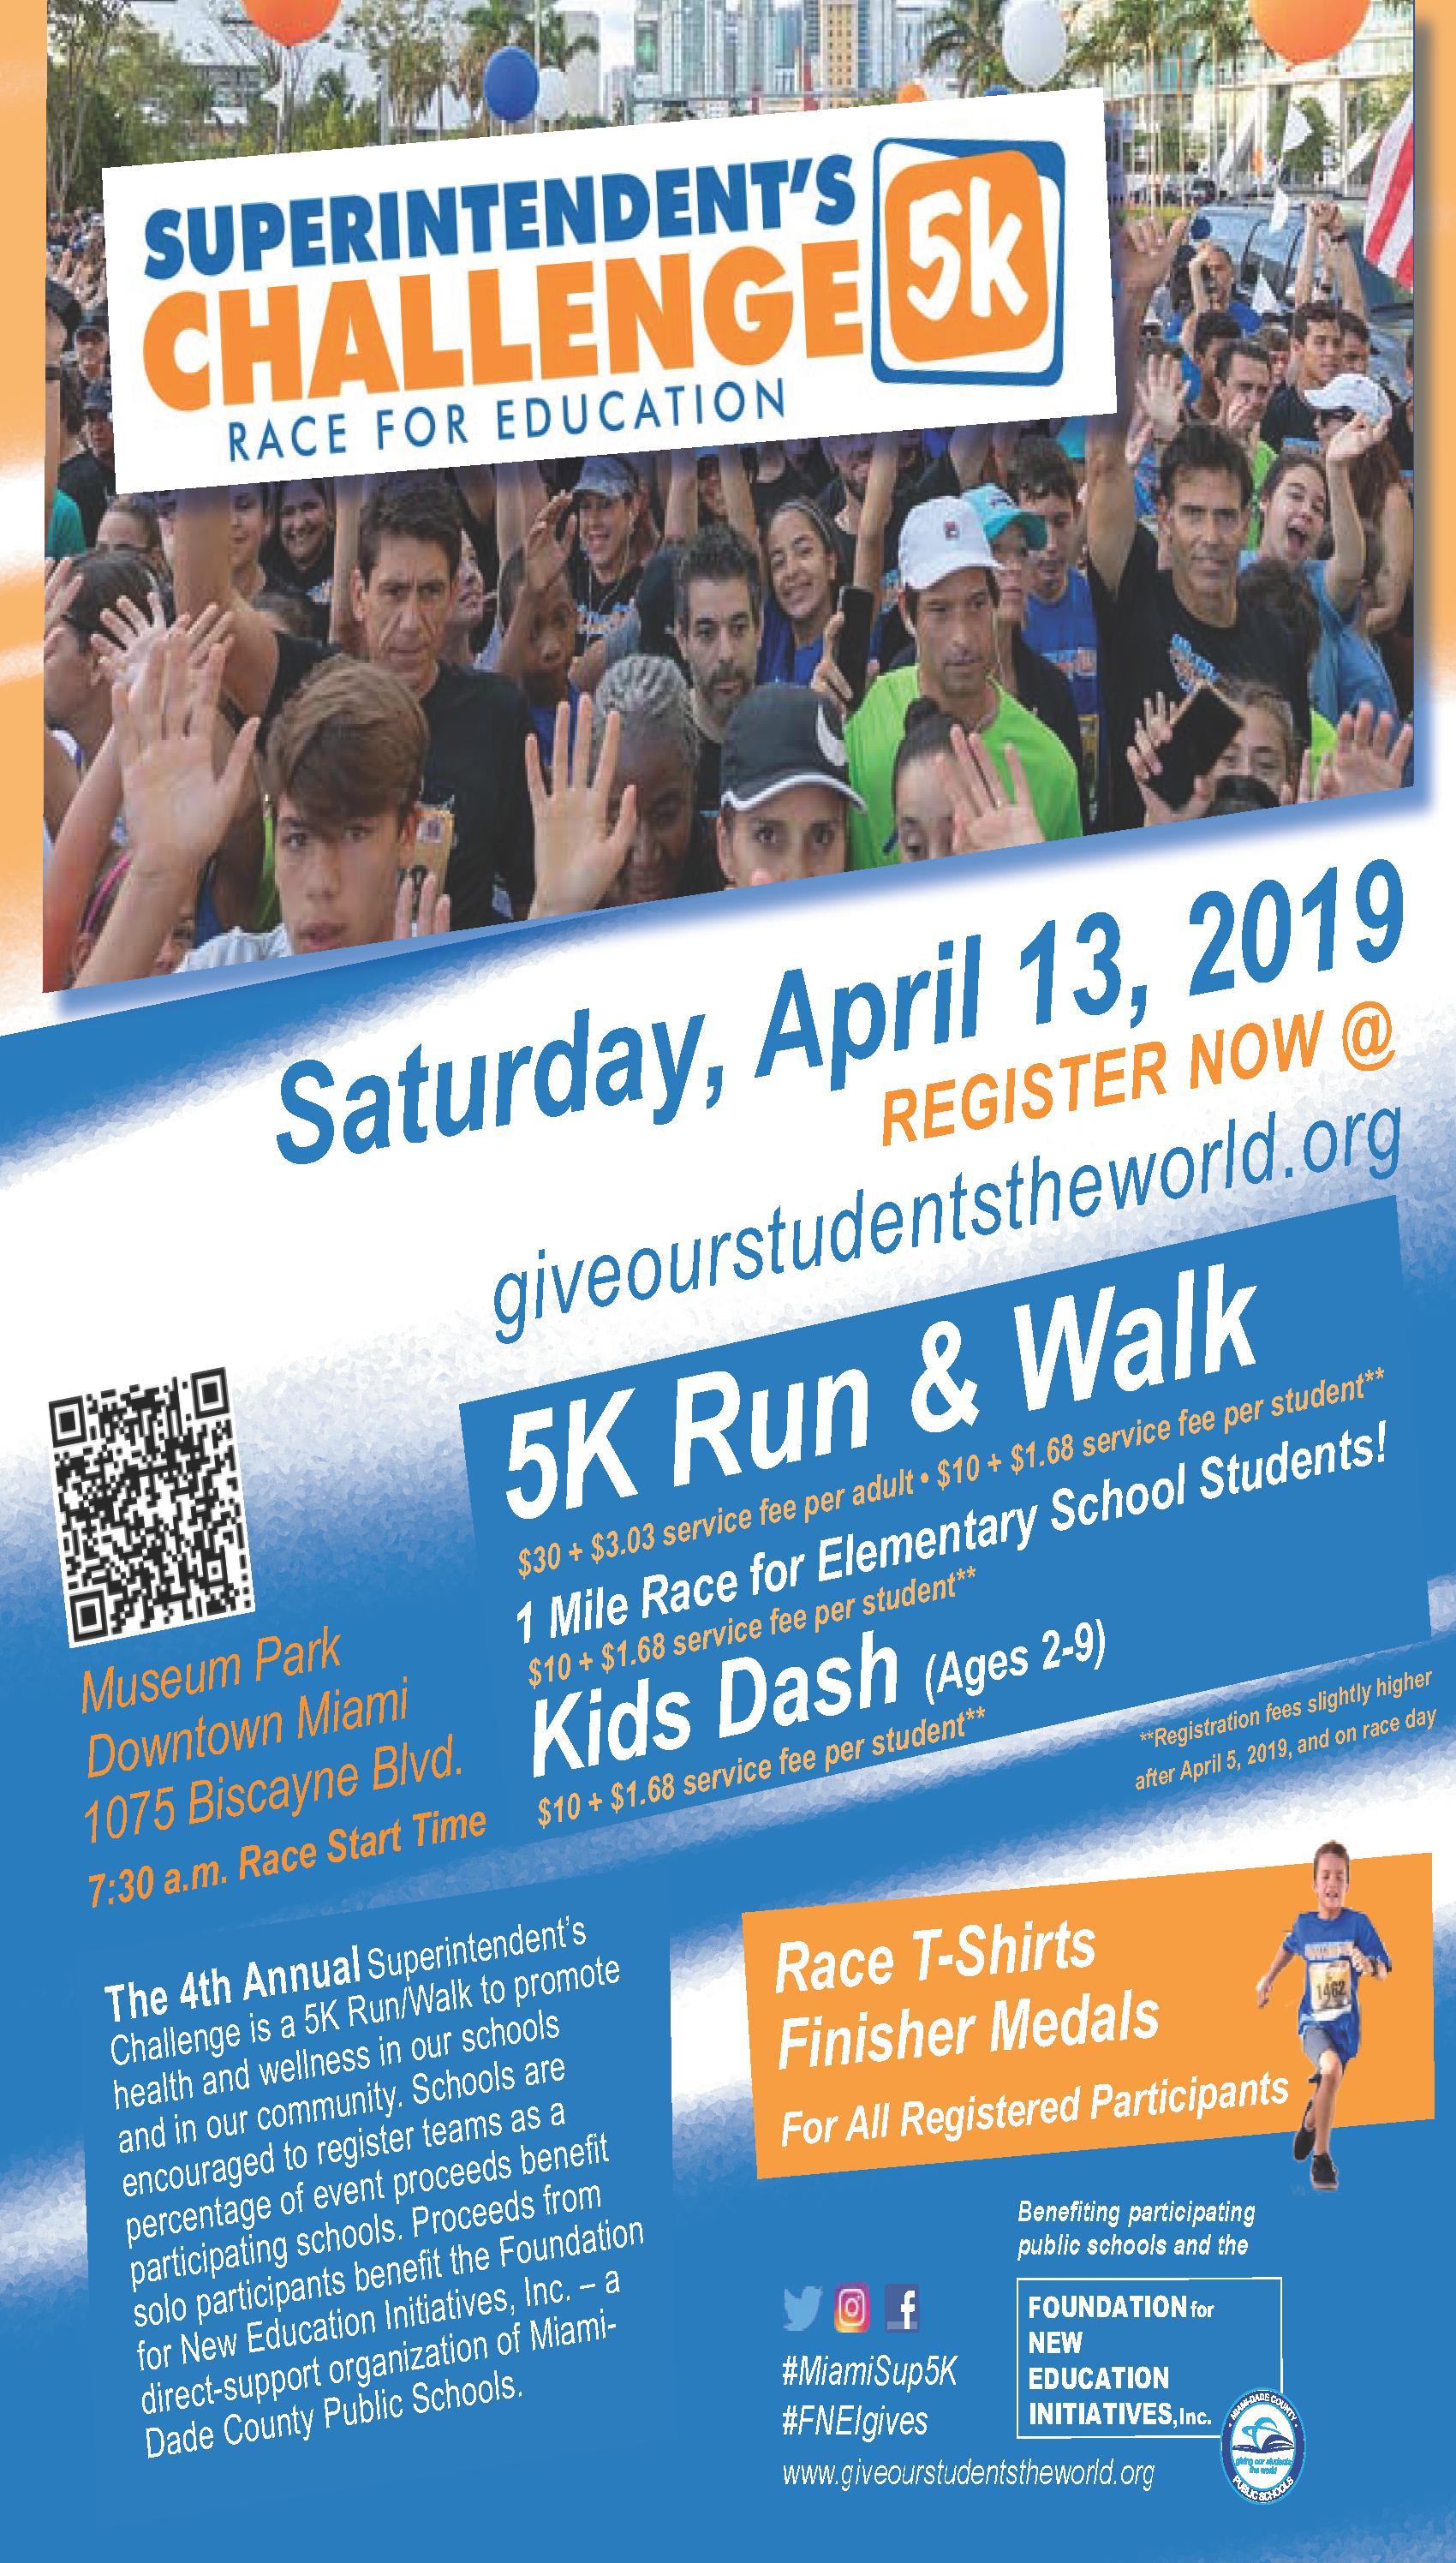 2019 Superintendent's 5K Run/Walk Race for Education @ Museum Park